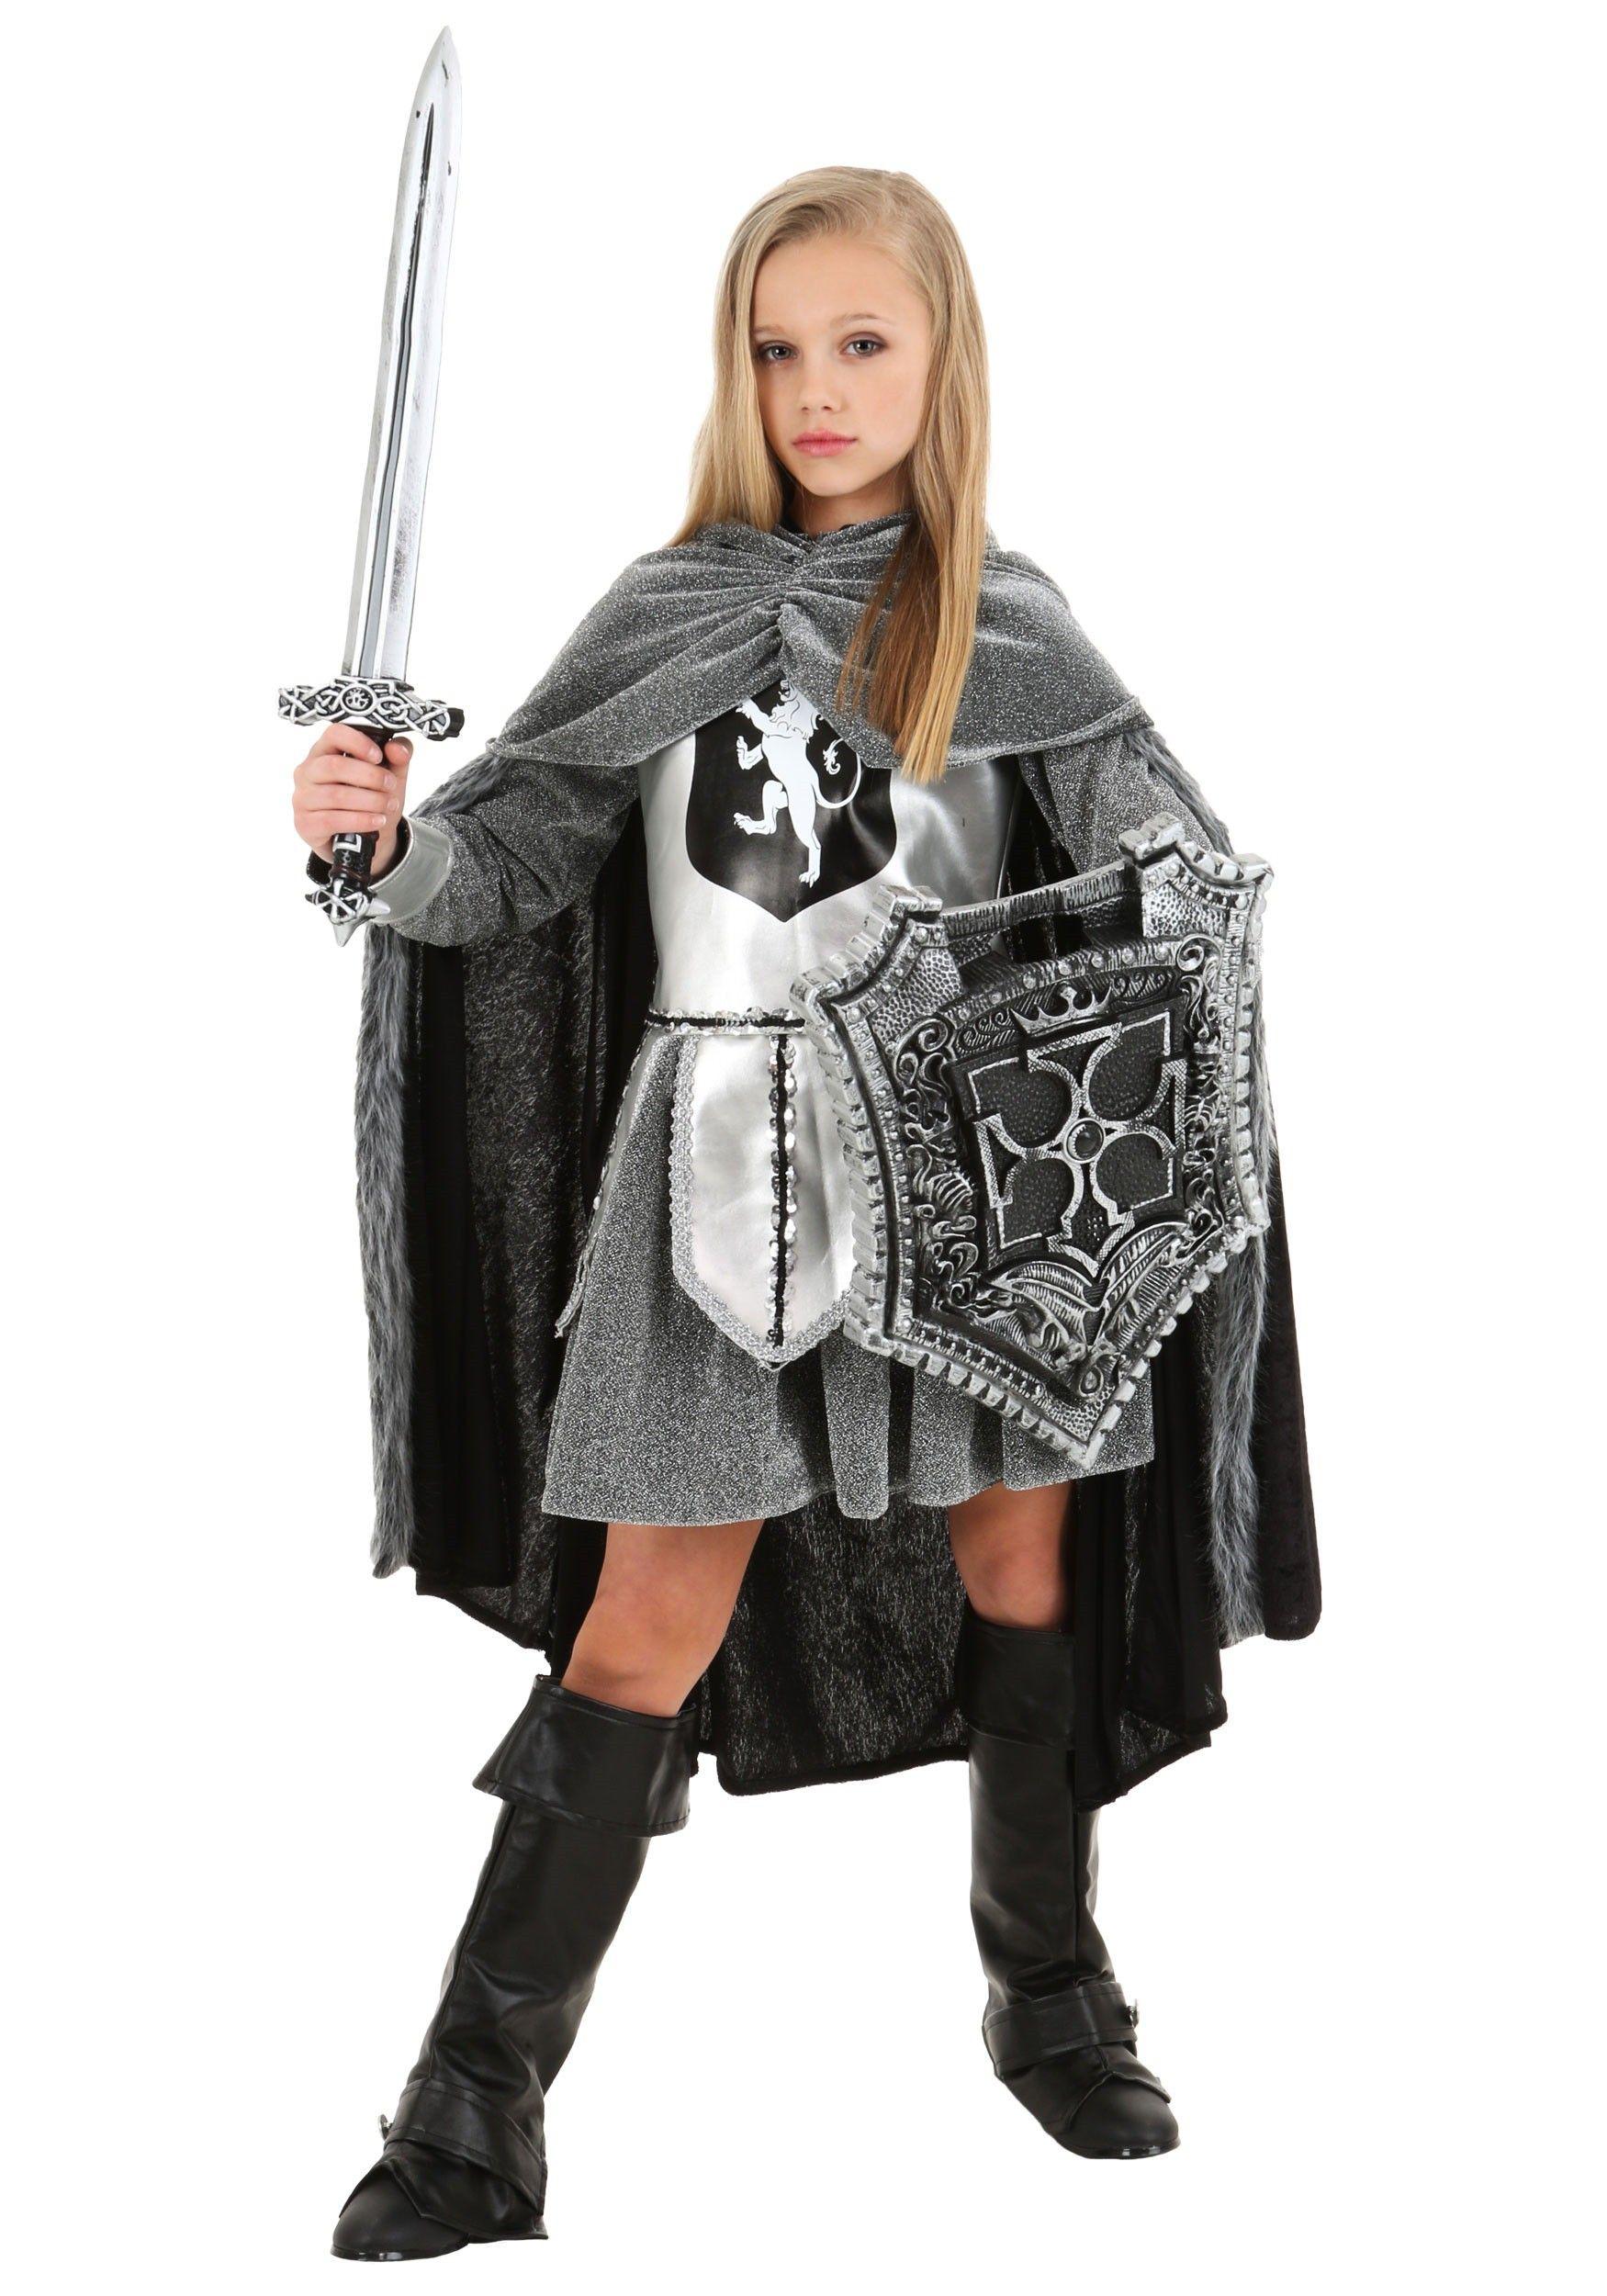 Knight Battle Armor Costume | Knight costume, Joan of arc ...